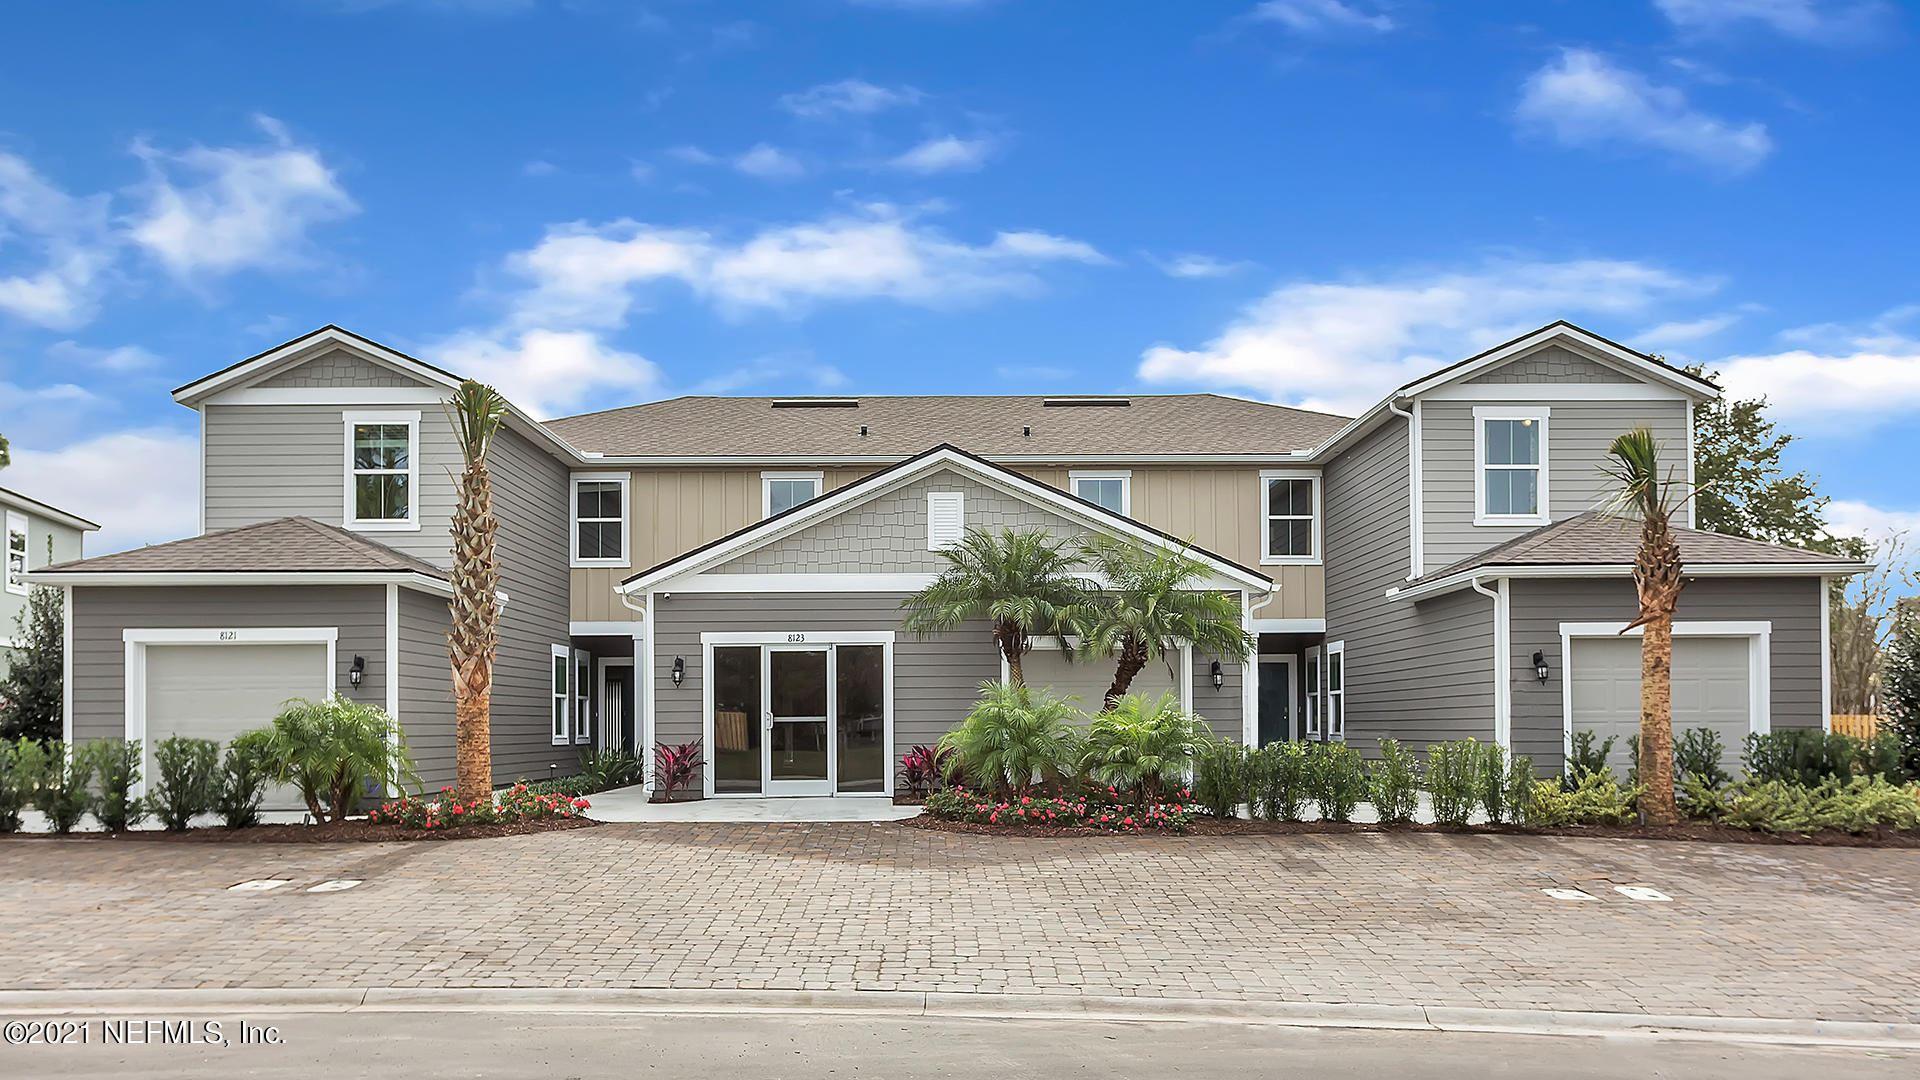 7694 LEGACY TRL #Lot No: 28, Jacksonville, FL 32256 - MLS#: 1101275